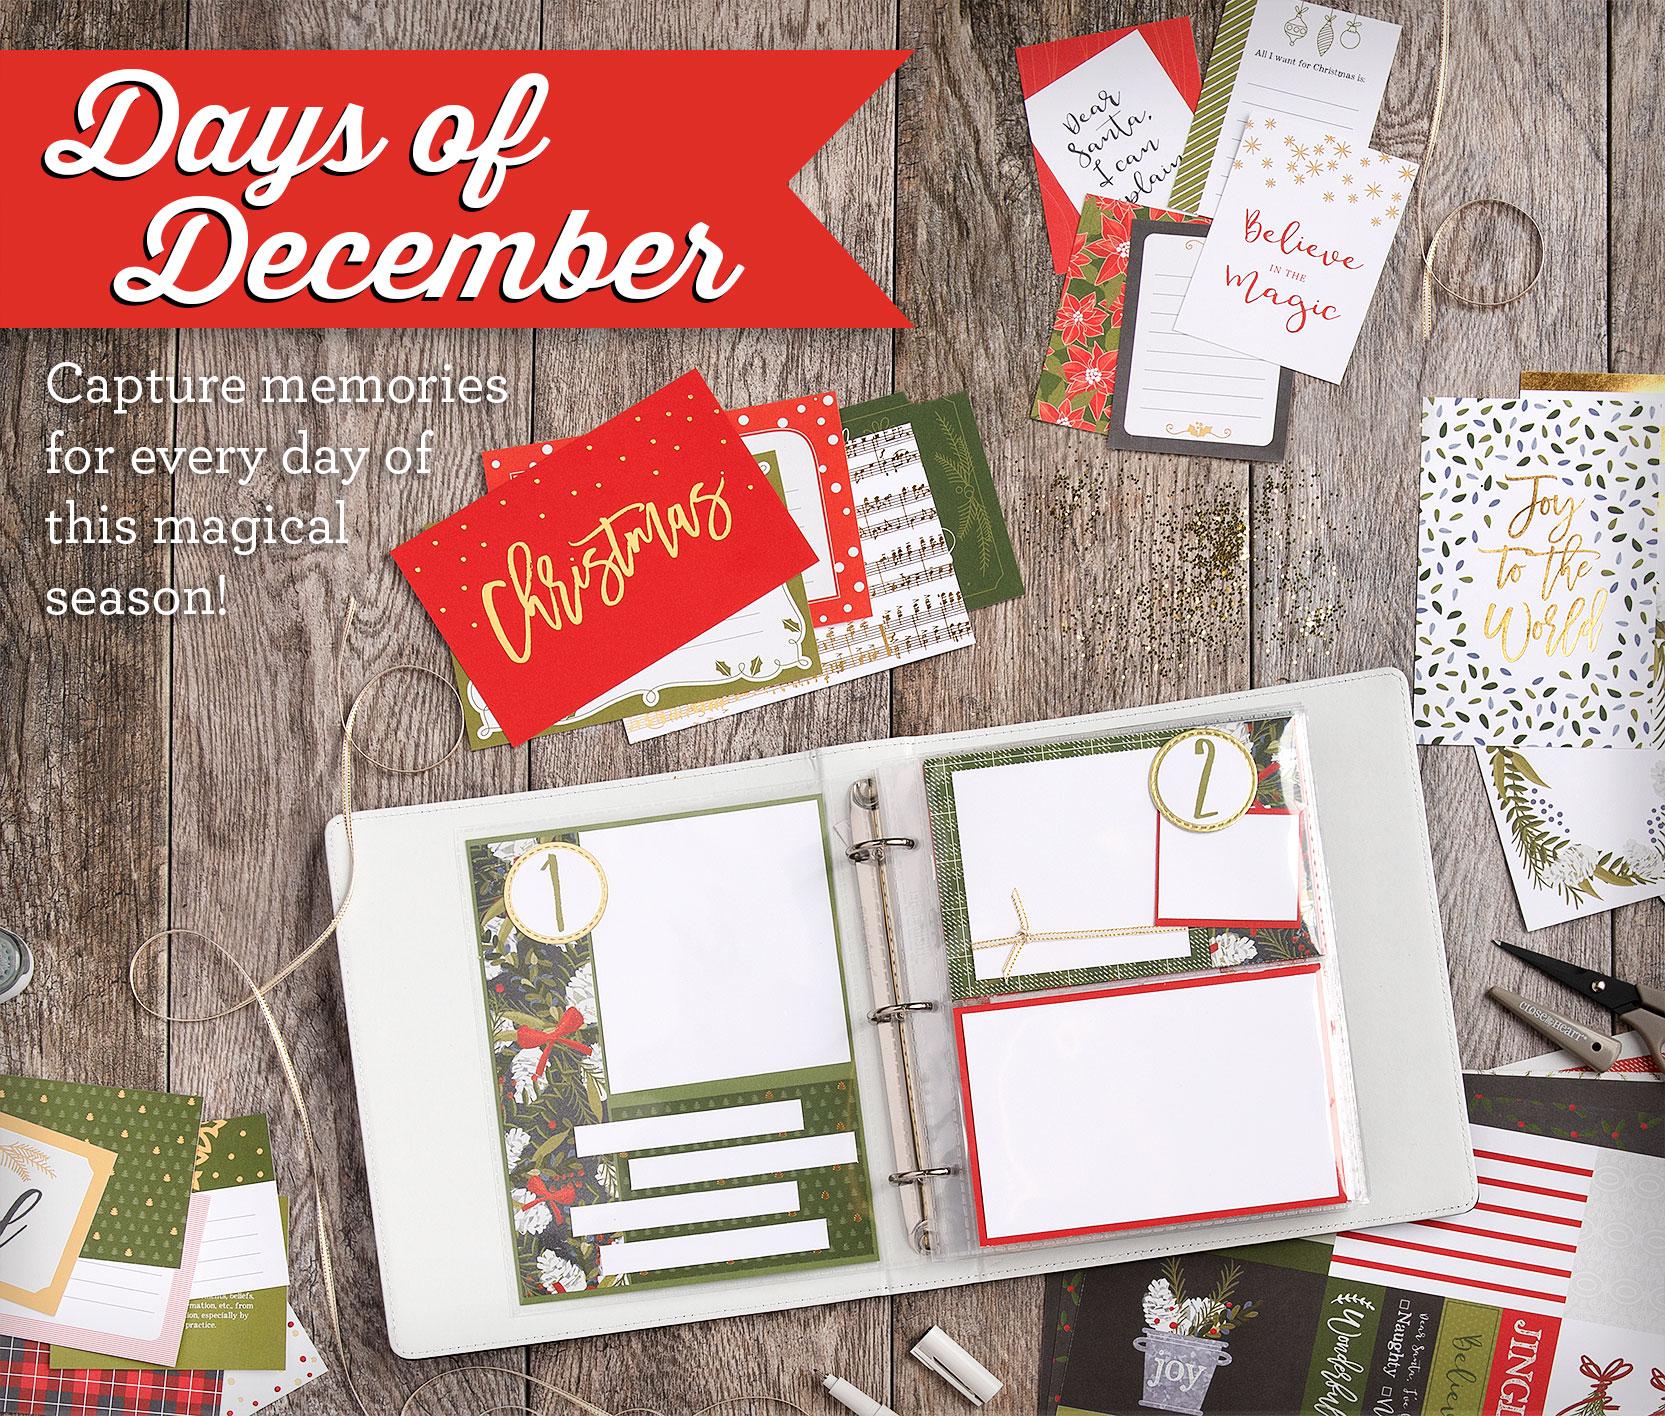 Days of December